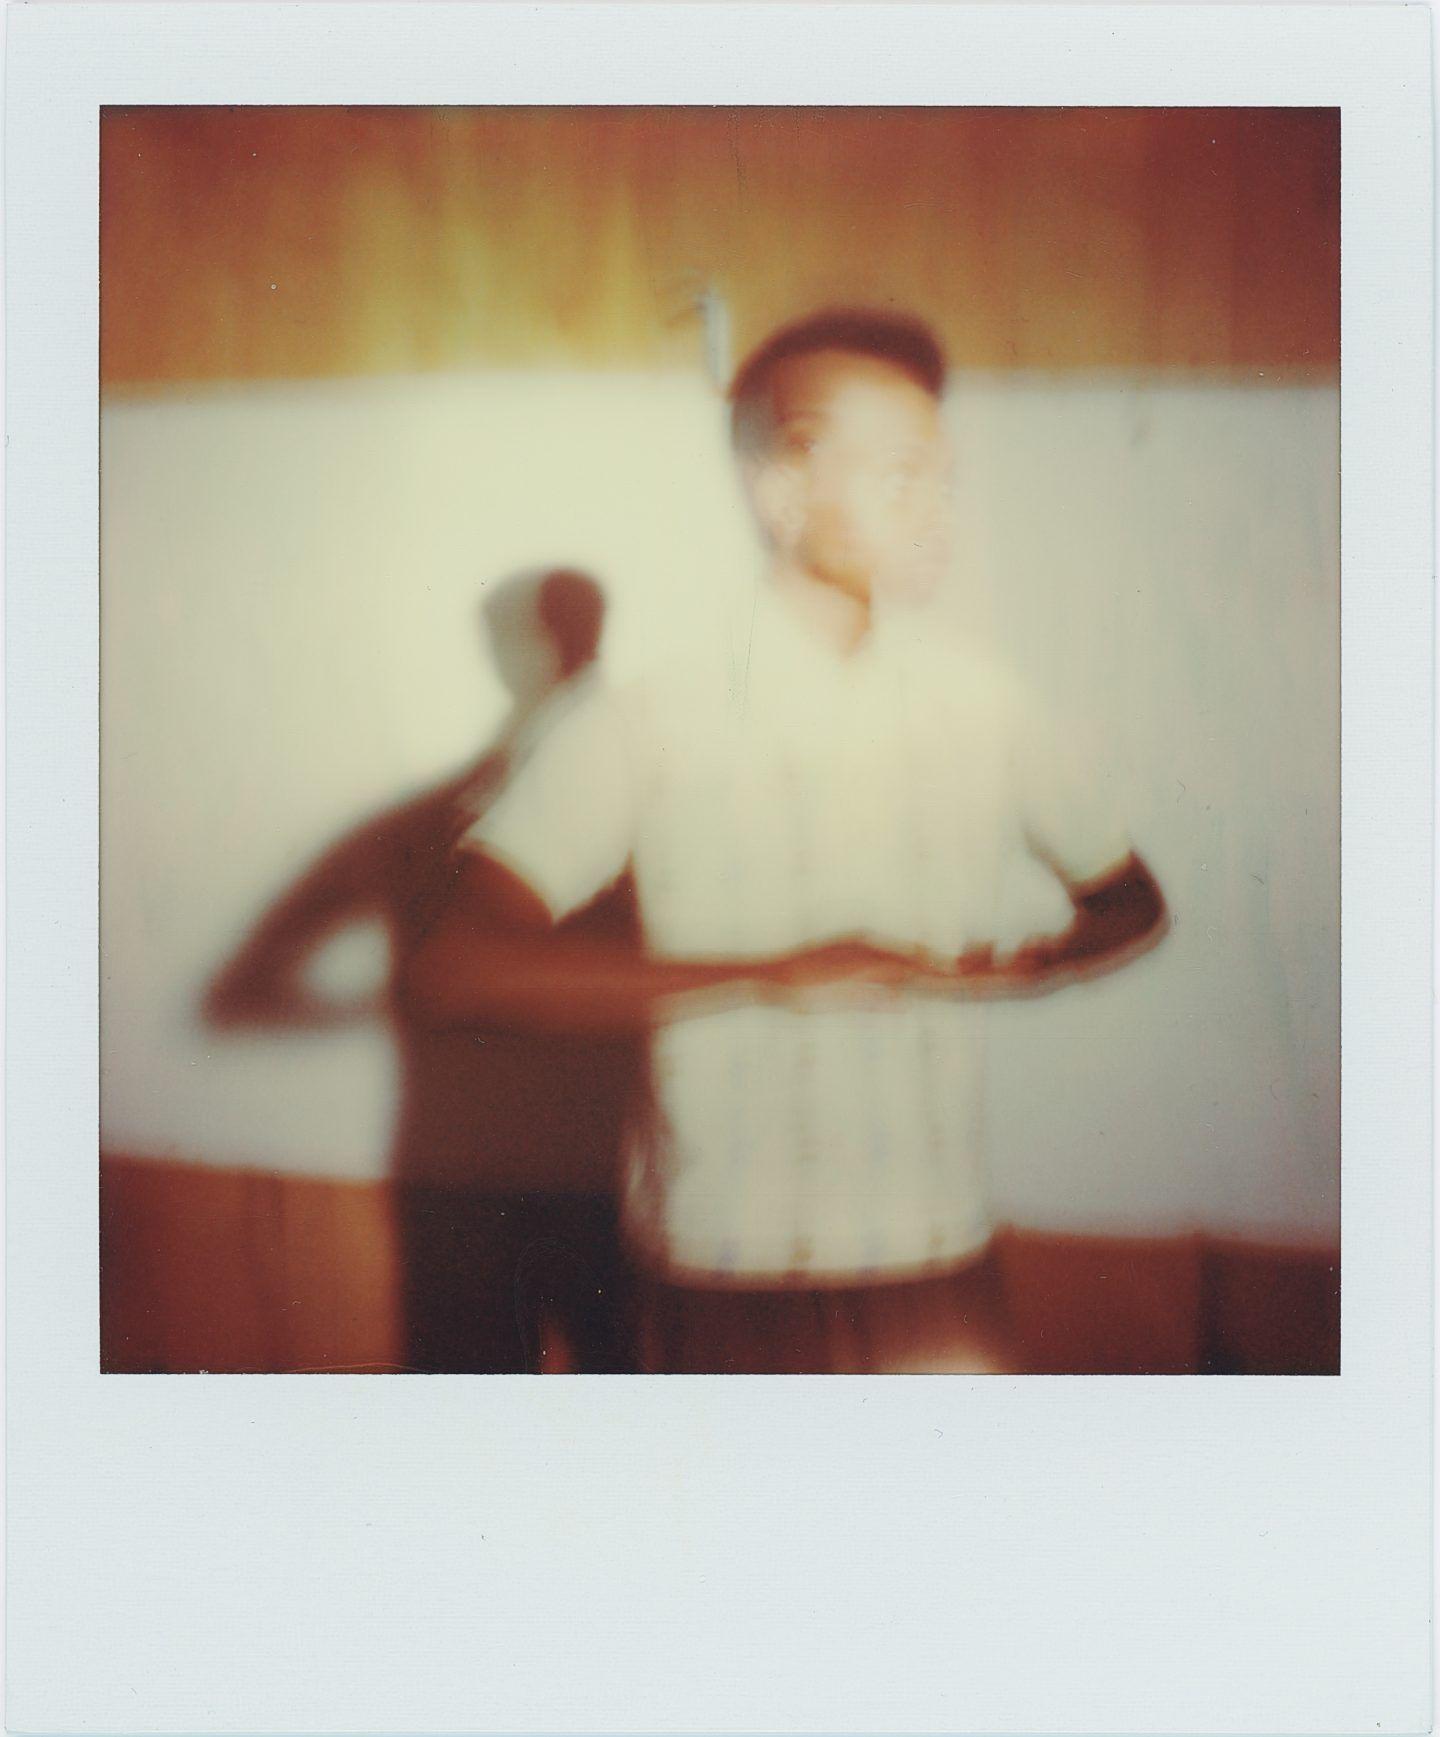 IGNANT-Photography-Dino-Kuznik-Jay-Versace-017